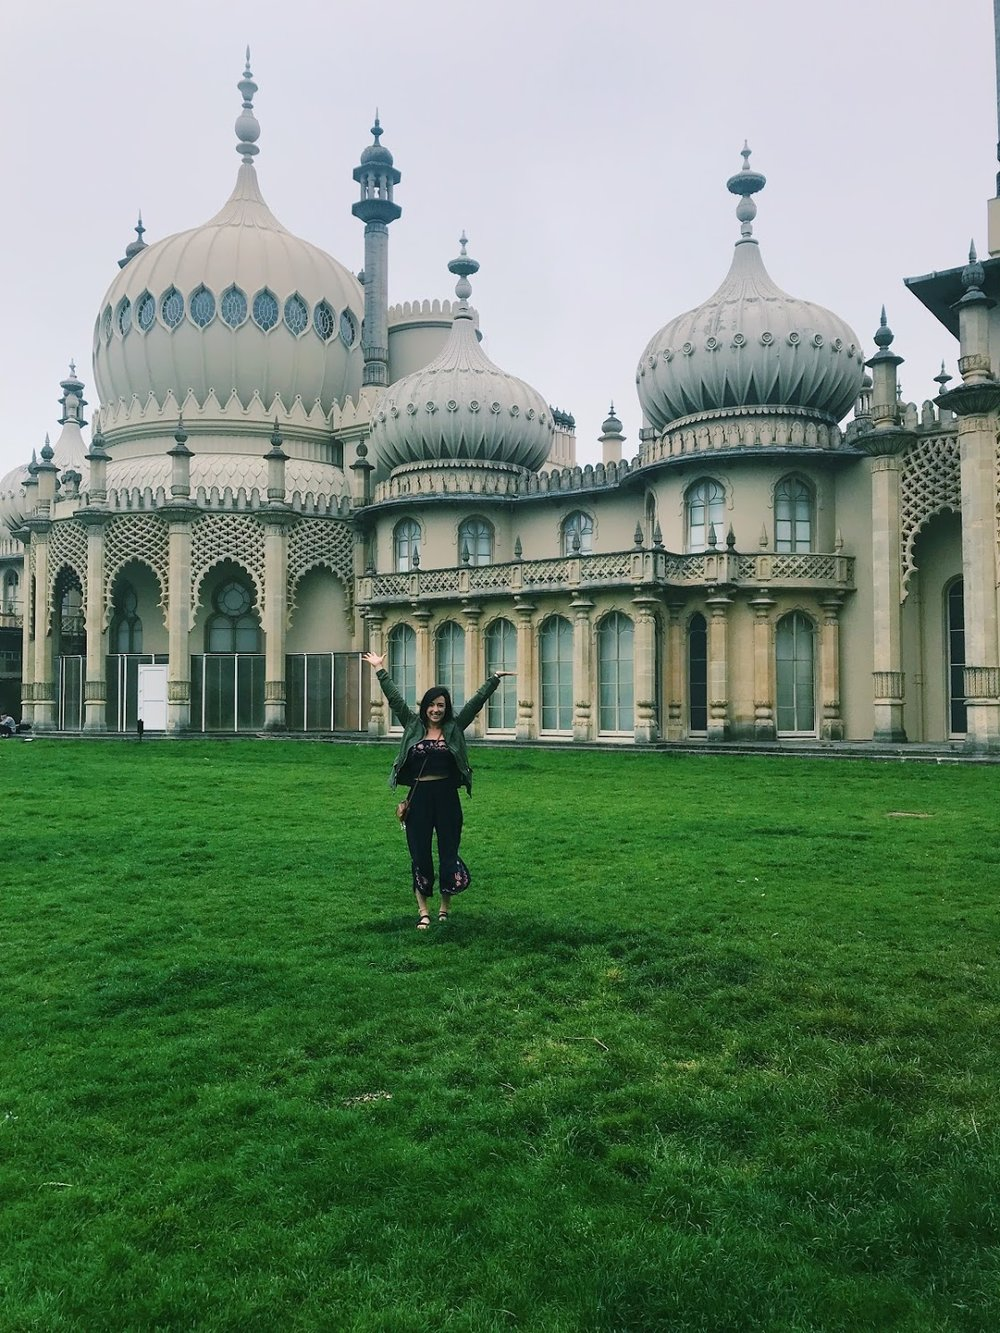 royal pavillion hailey heishman.jpg